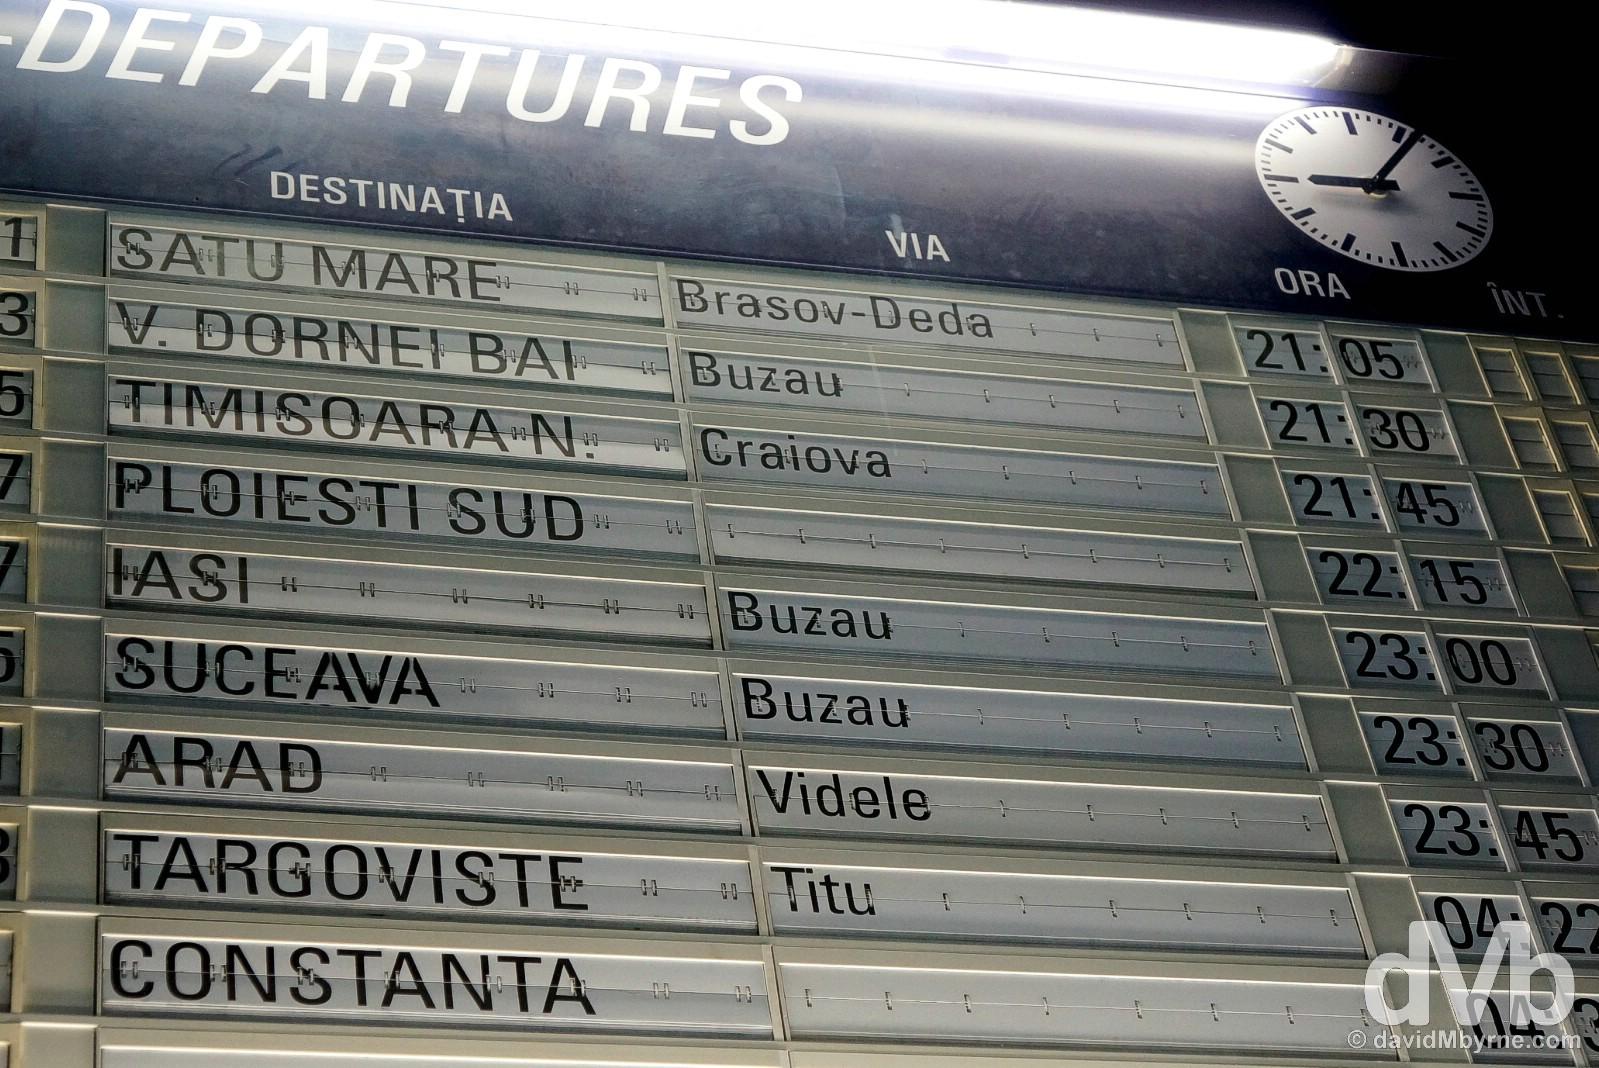 Night train to Belgrade, Serbia. The departures board in Gara de Nord, Bucharest, Romania. April 2, 2015.